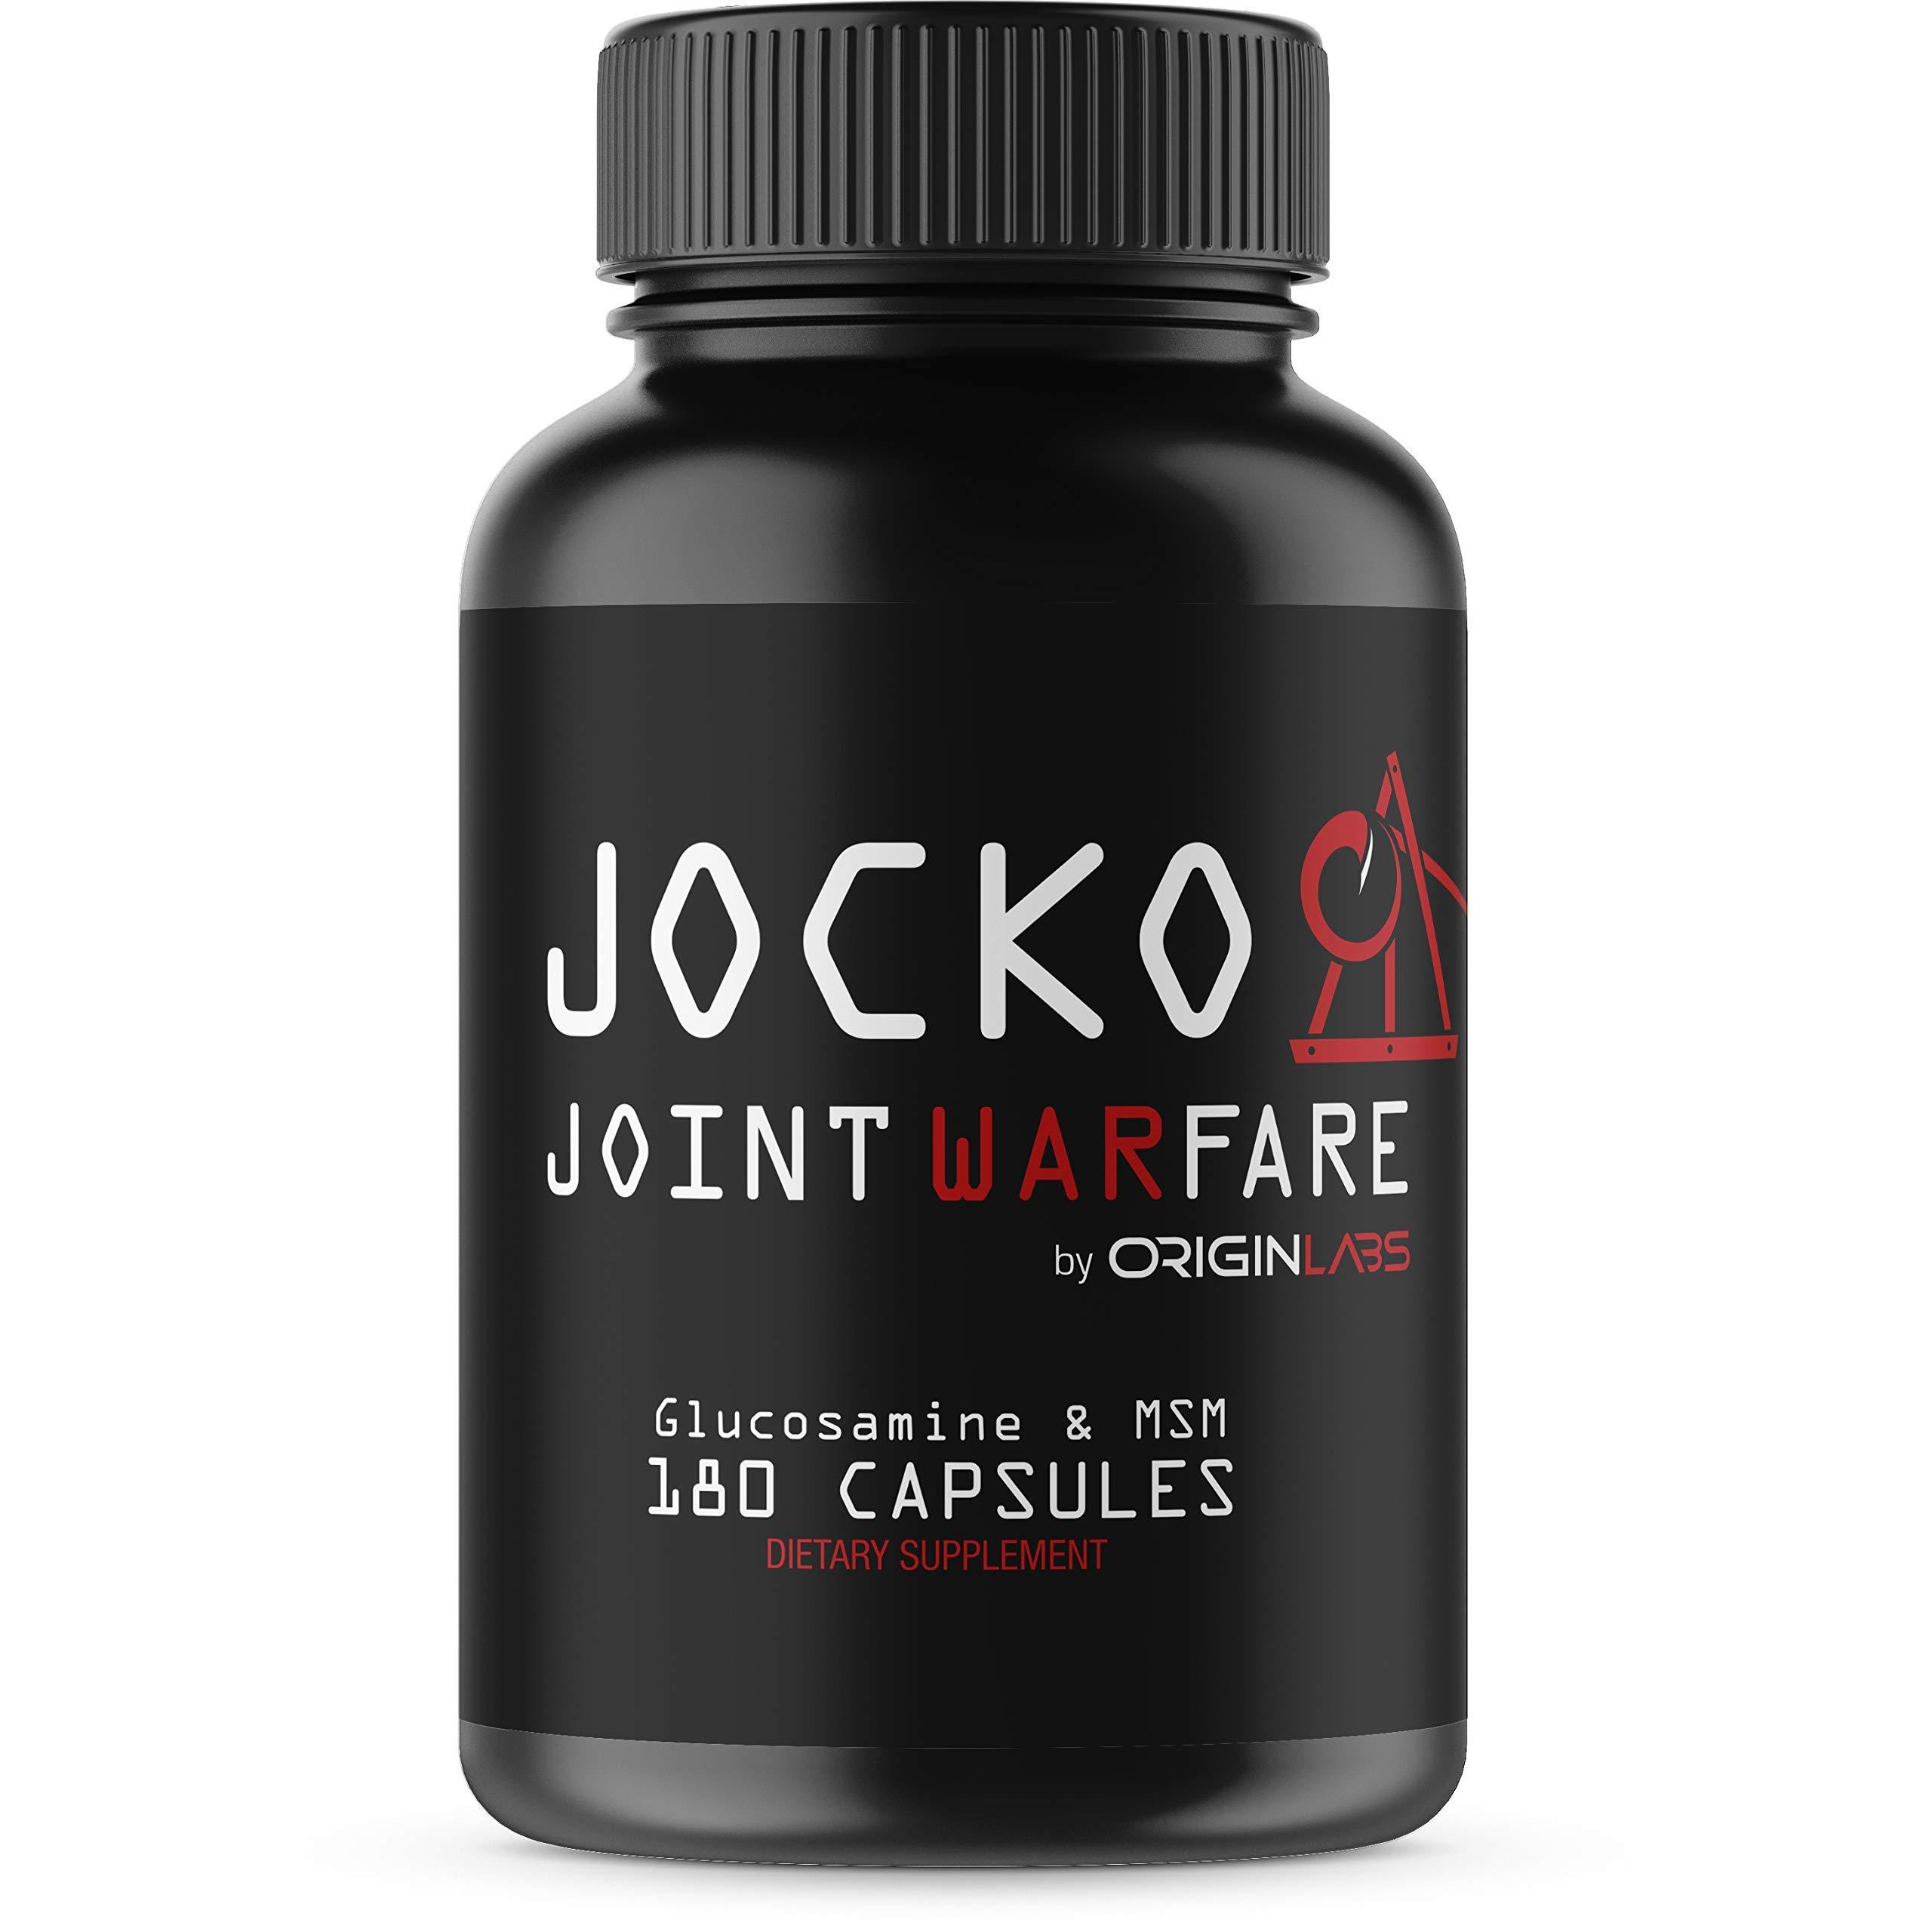 Jocko Joint Warfare - Curcumin, Glucosamine, MSM, Boswellia, Quercetin - Joint Support Supplement 180 Tablets